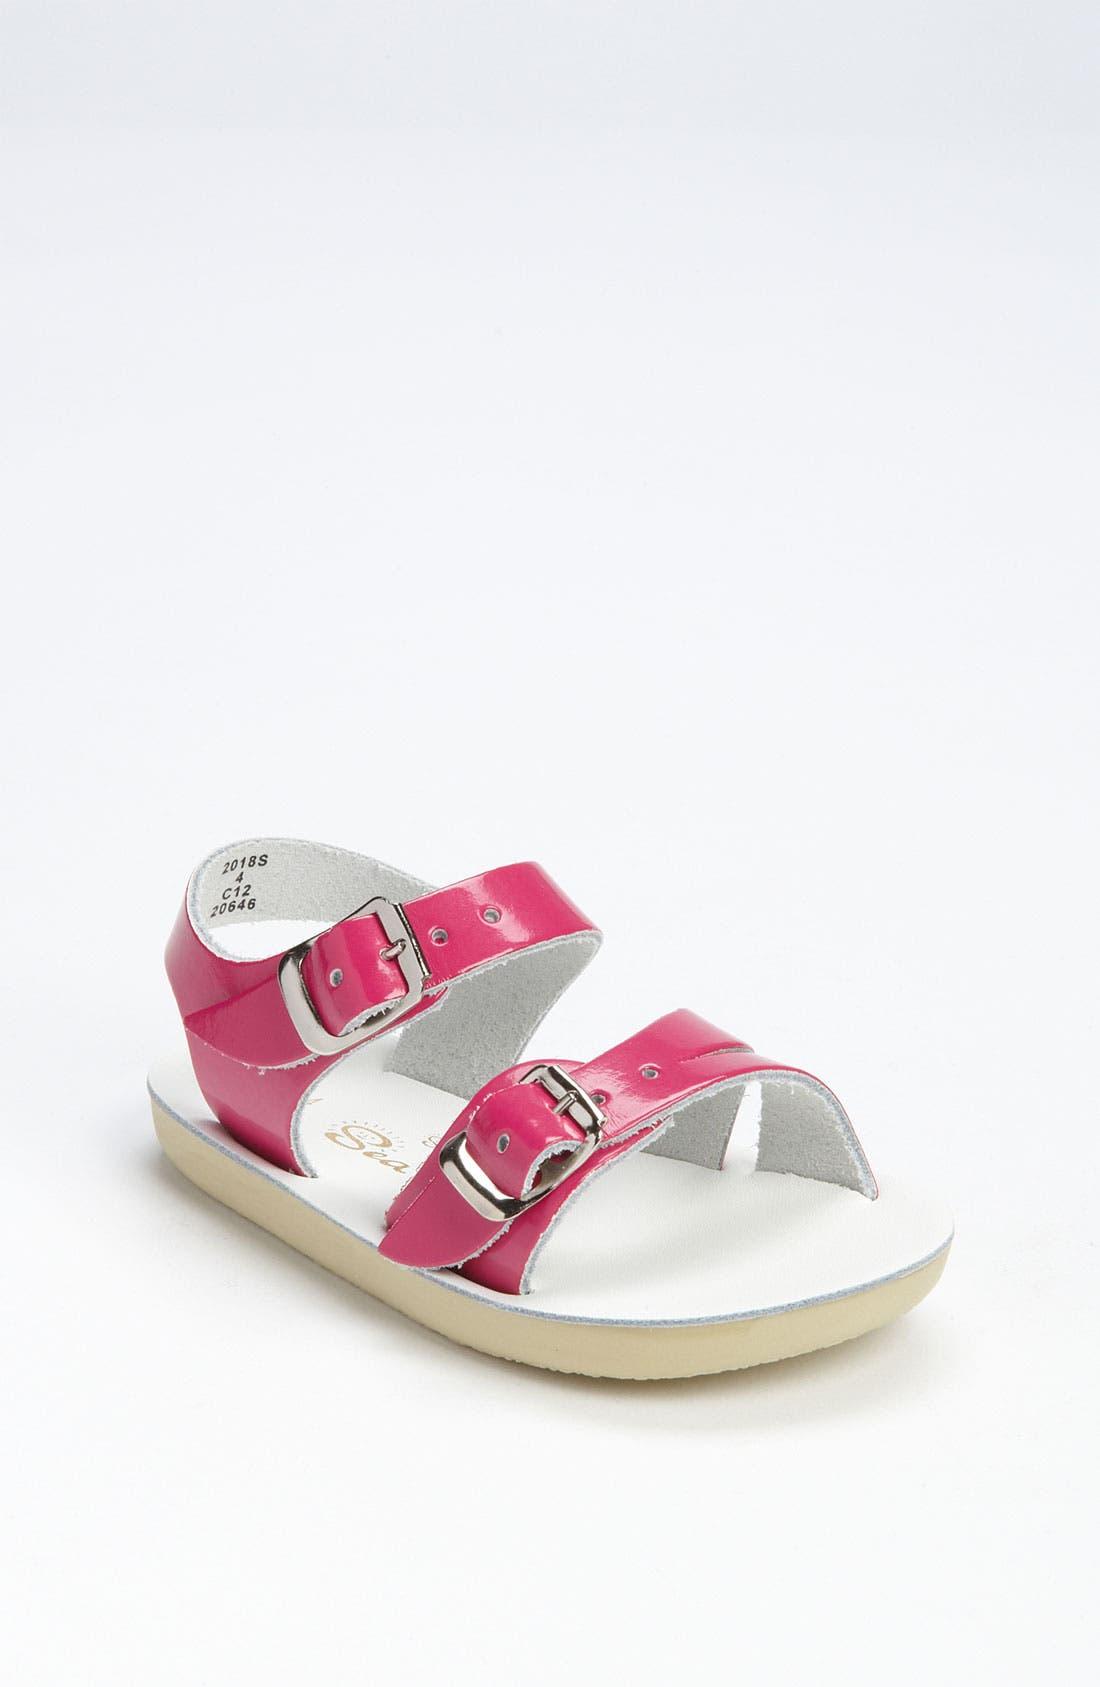 Main Image - Salt Water Sandals by Hoy 'Sea Wee' Sandal (Baby)